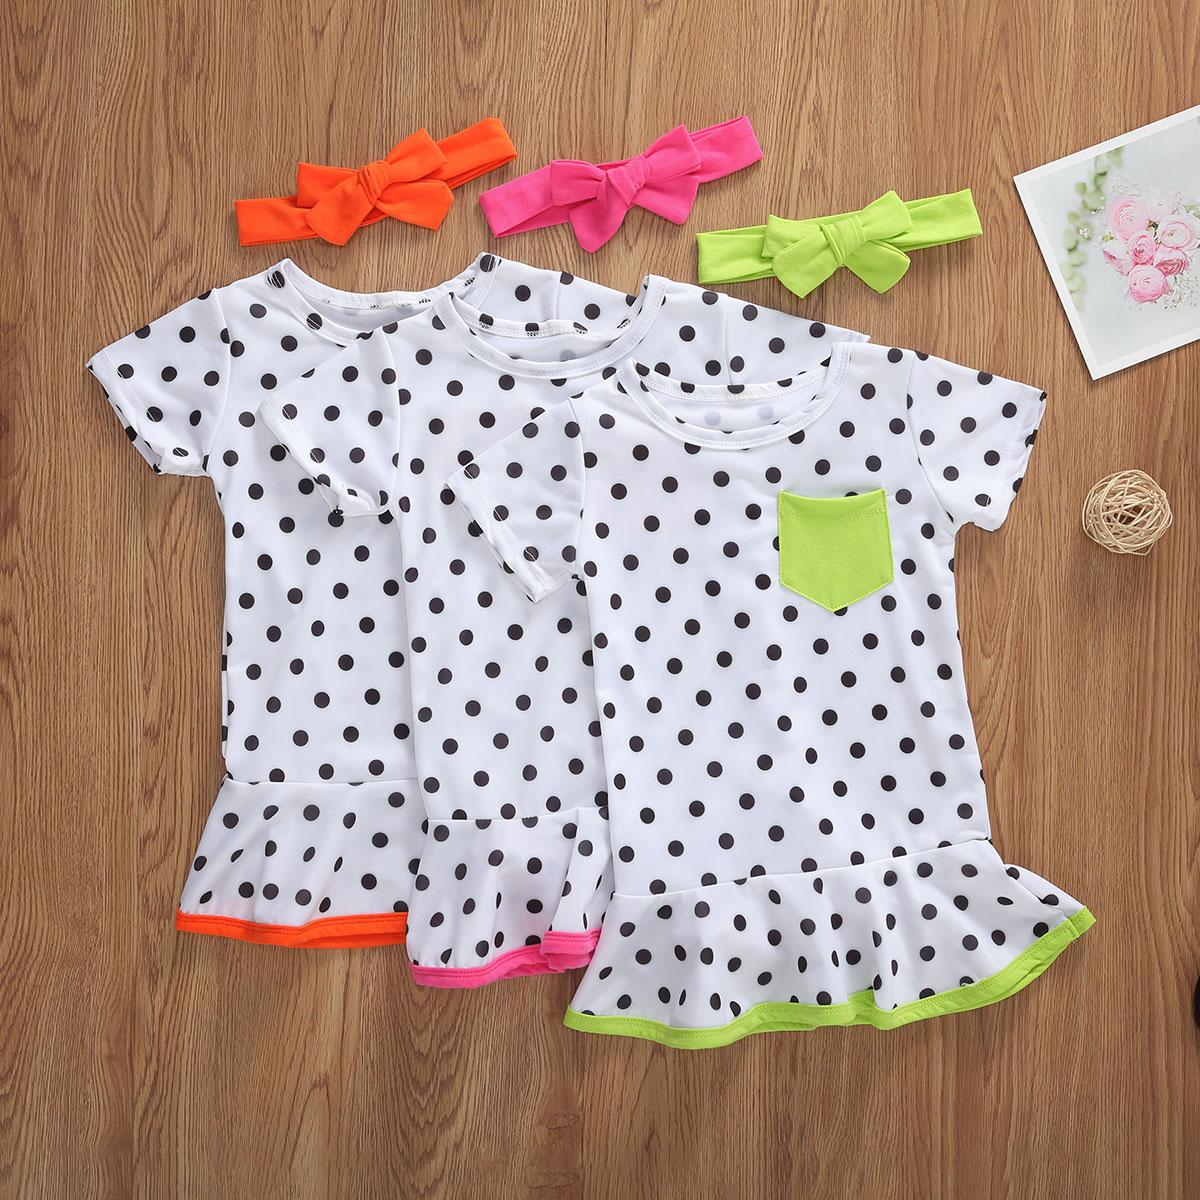 US $5.5 Summer kids casual plain dresses Fashion New Infant Toddler Baby  Girls Ruffle A line Sundress Short sleeve Polka Dots DressesDresses -